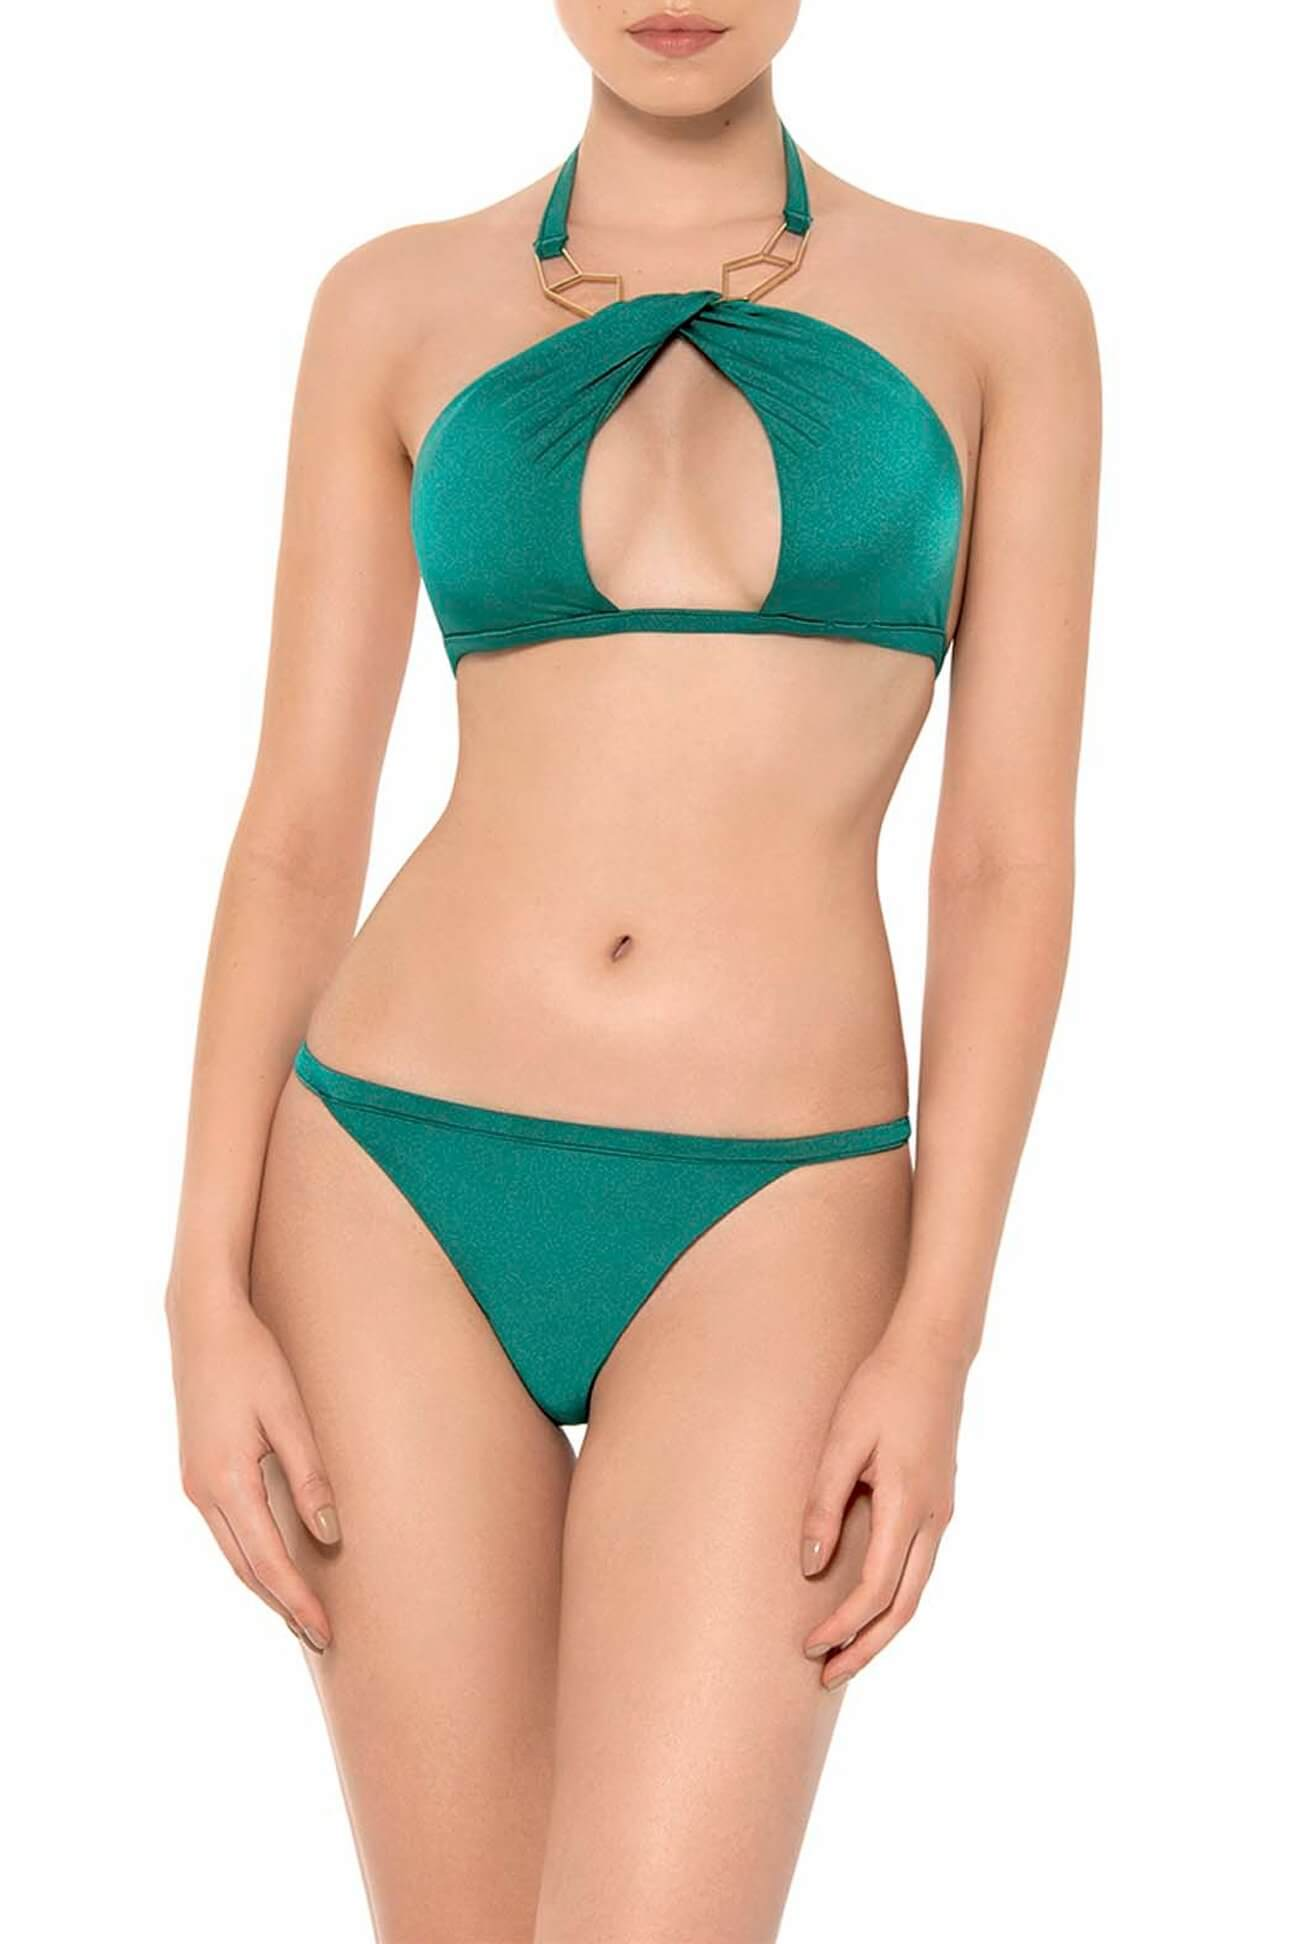 Smarald Cheeky Bikini Bottom